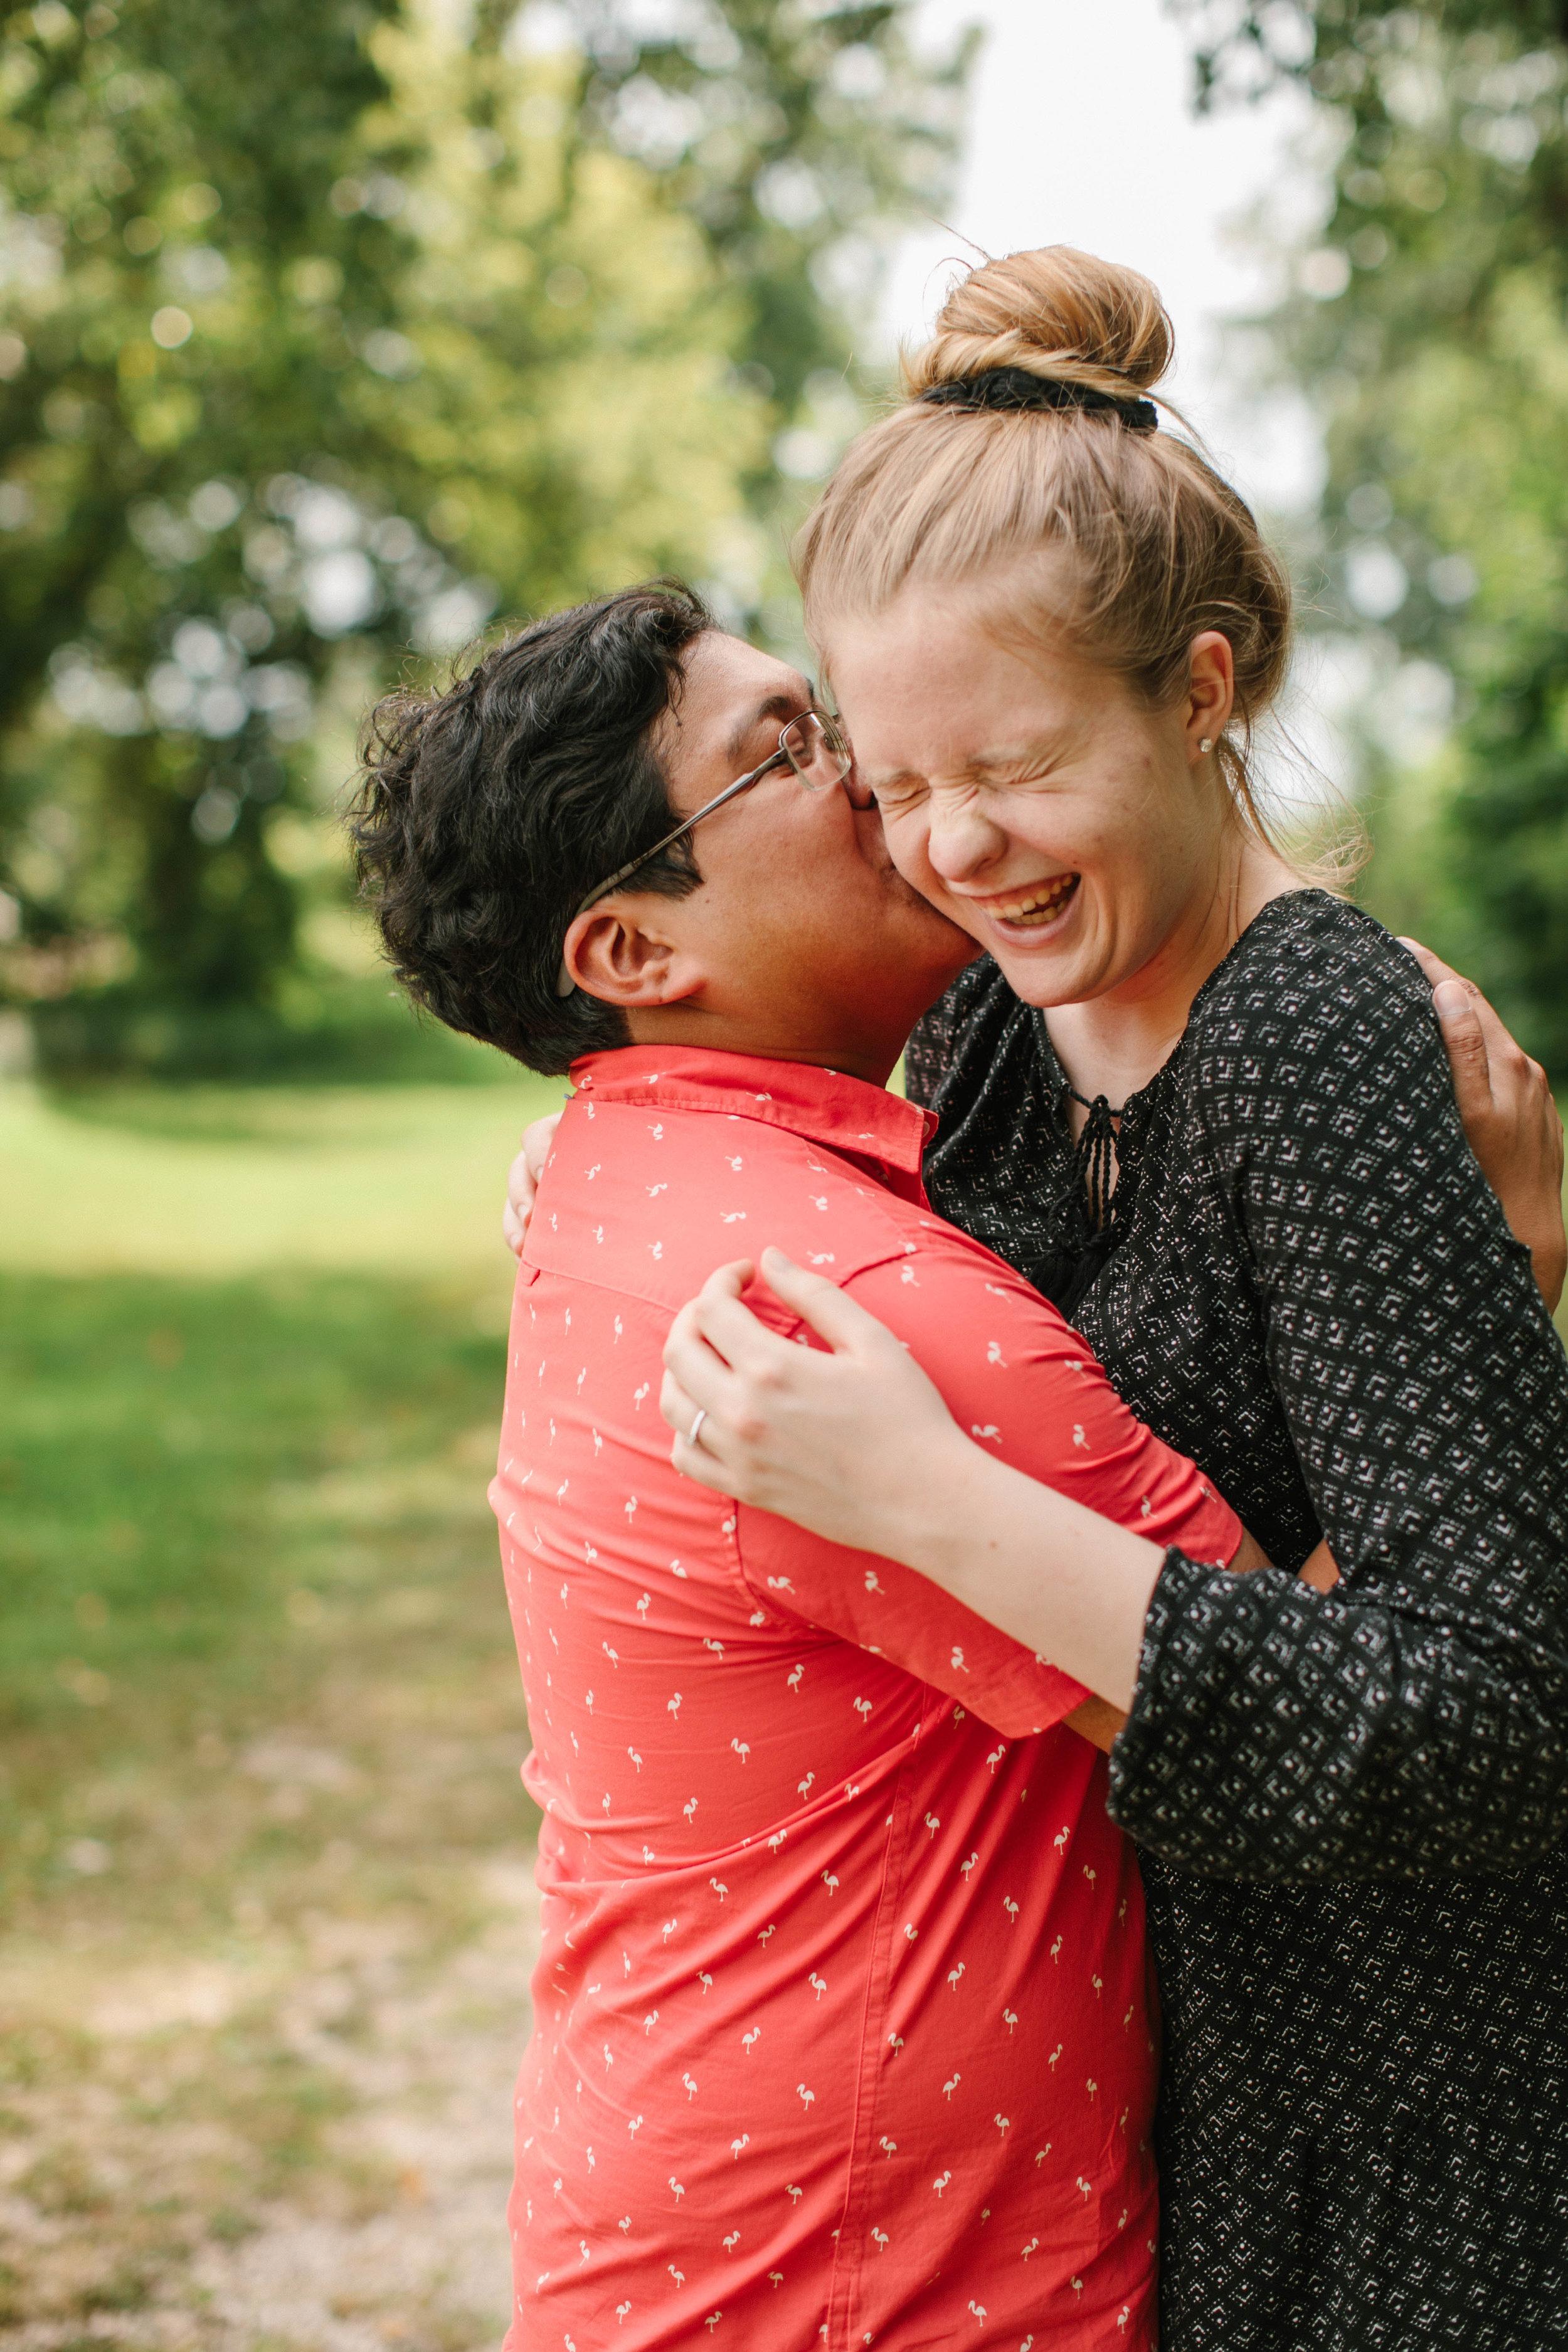 cedar falls iowa engagement wedding photographers under $3000